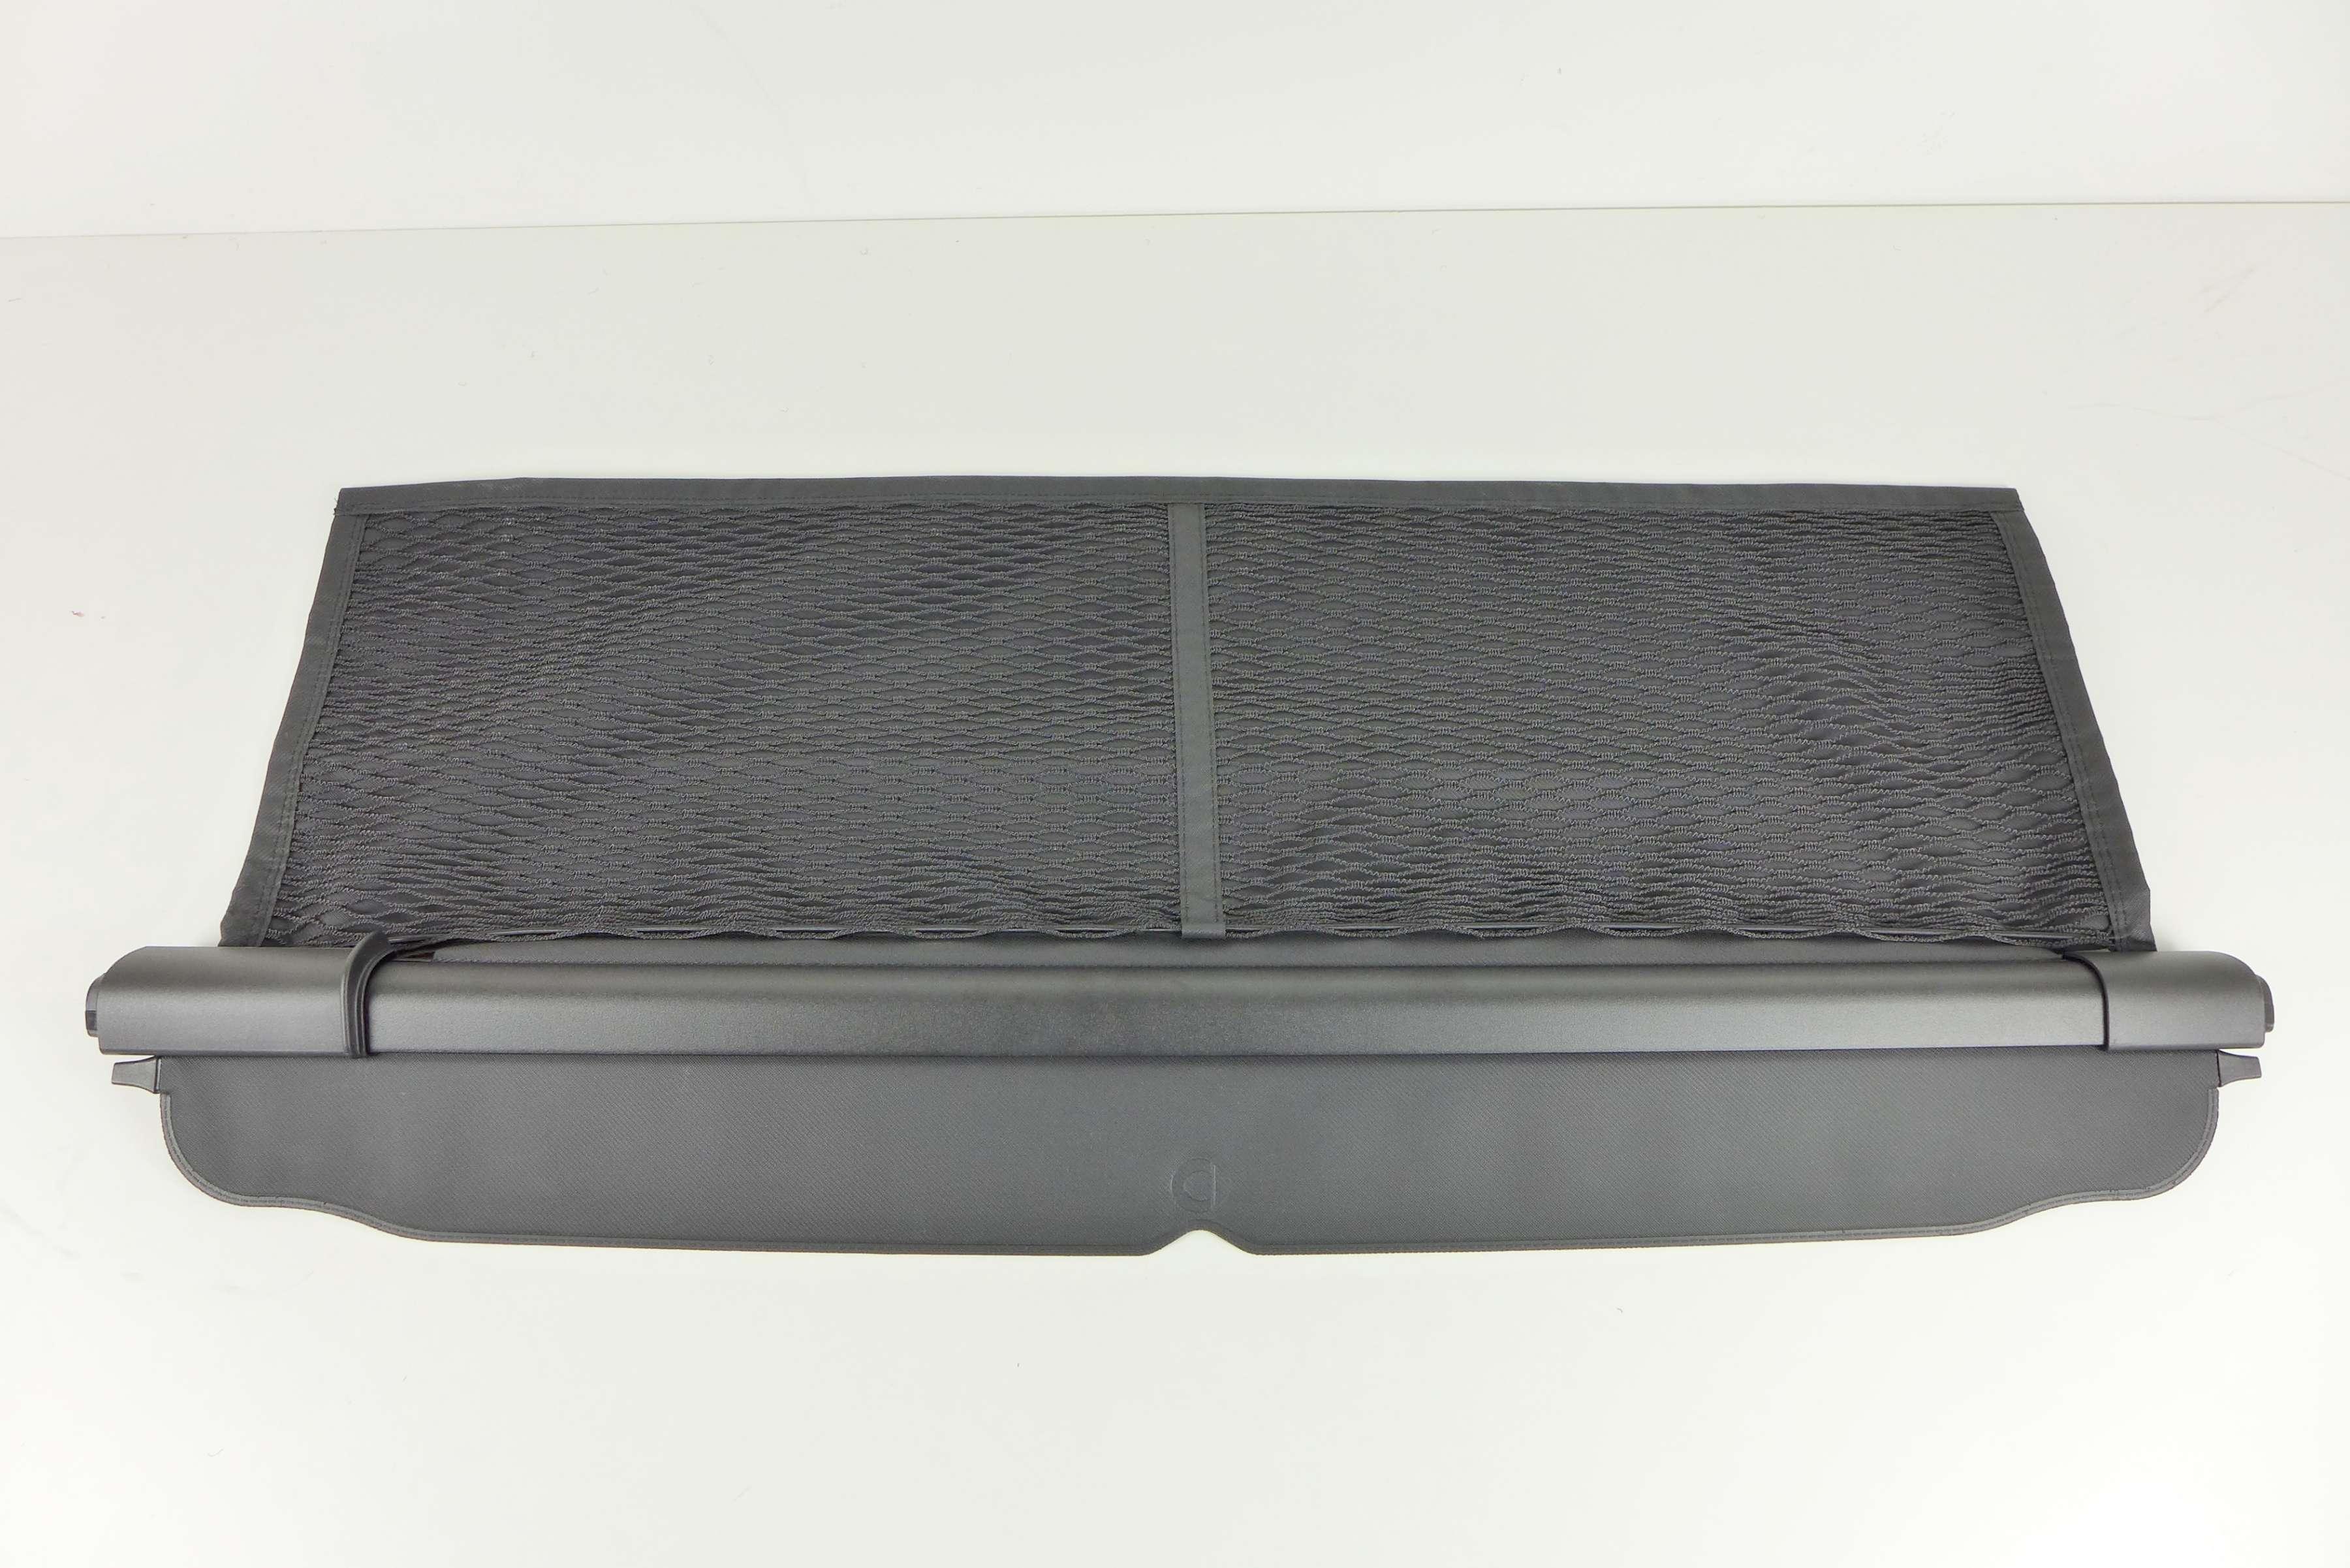 cale capot smart fortwo 451 coup cabriolet coffre capot a4518100009 ebay. Black Bedroom Furniture Sets. Home Design Ideas